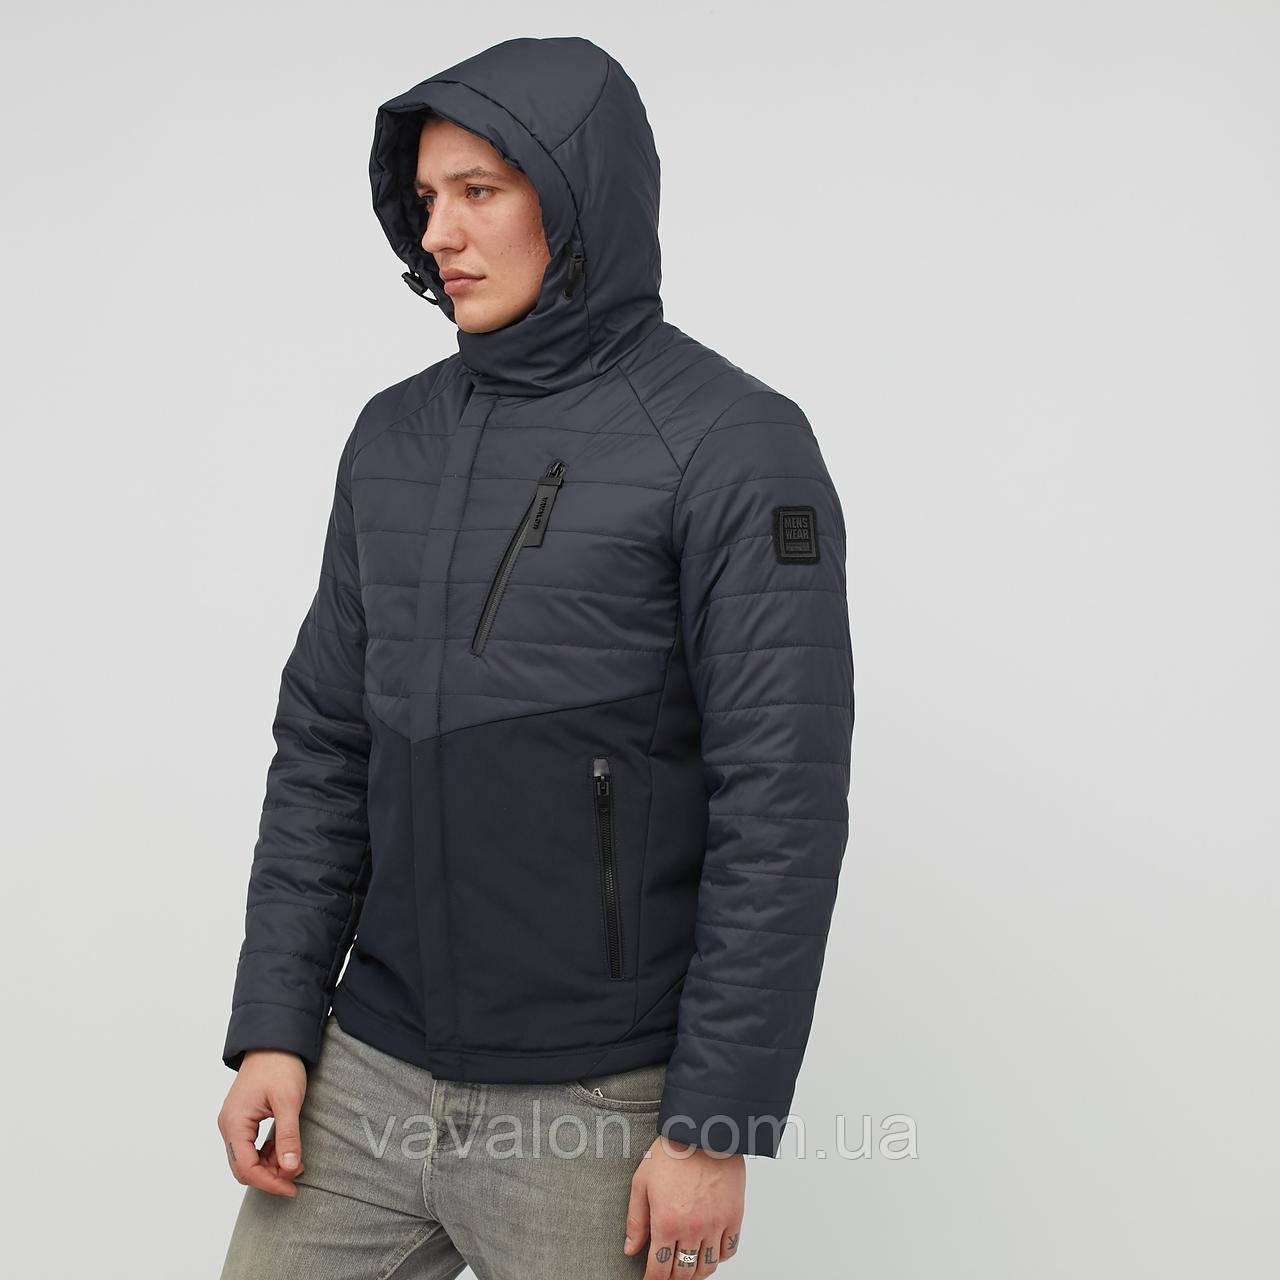 Куртка демисезонная Vavalon KD-801 Black